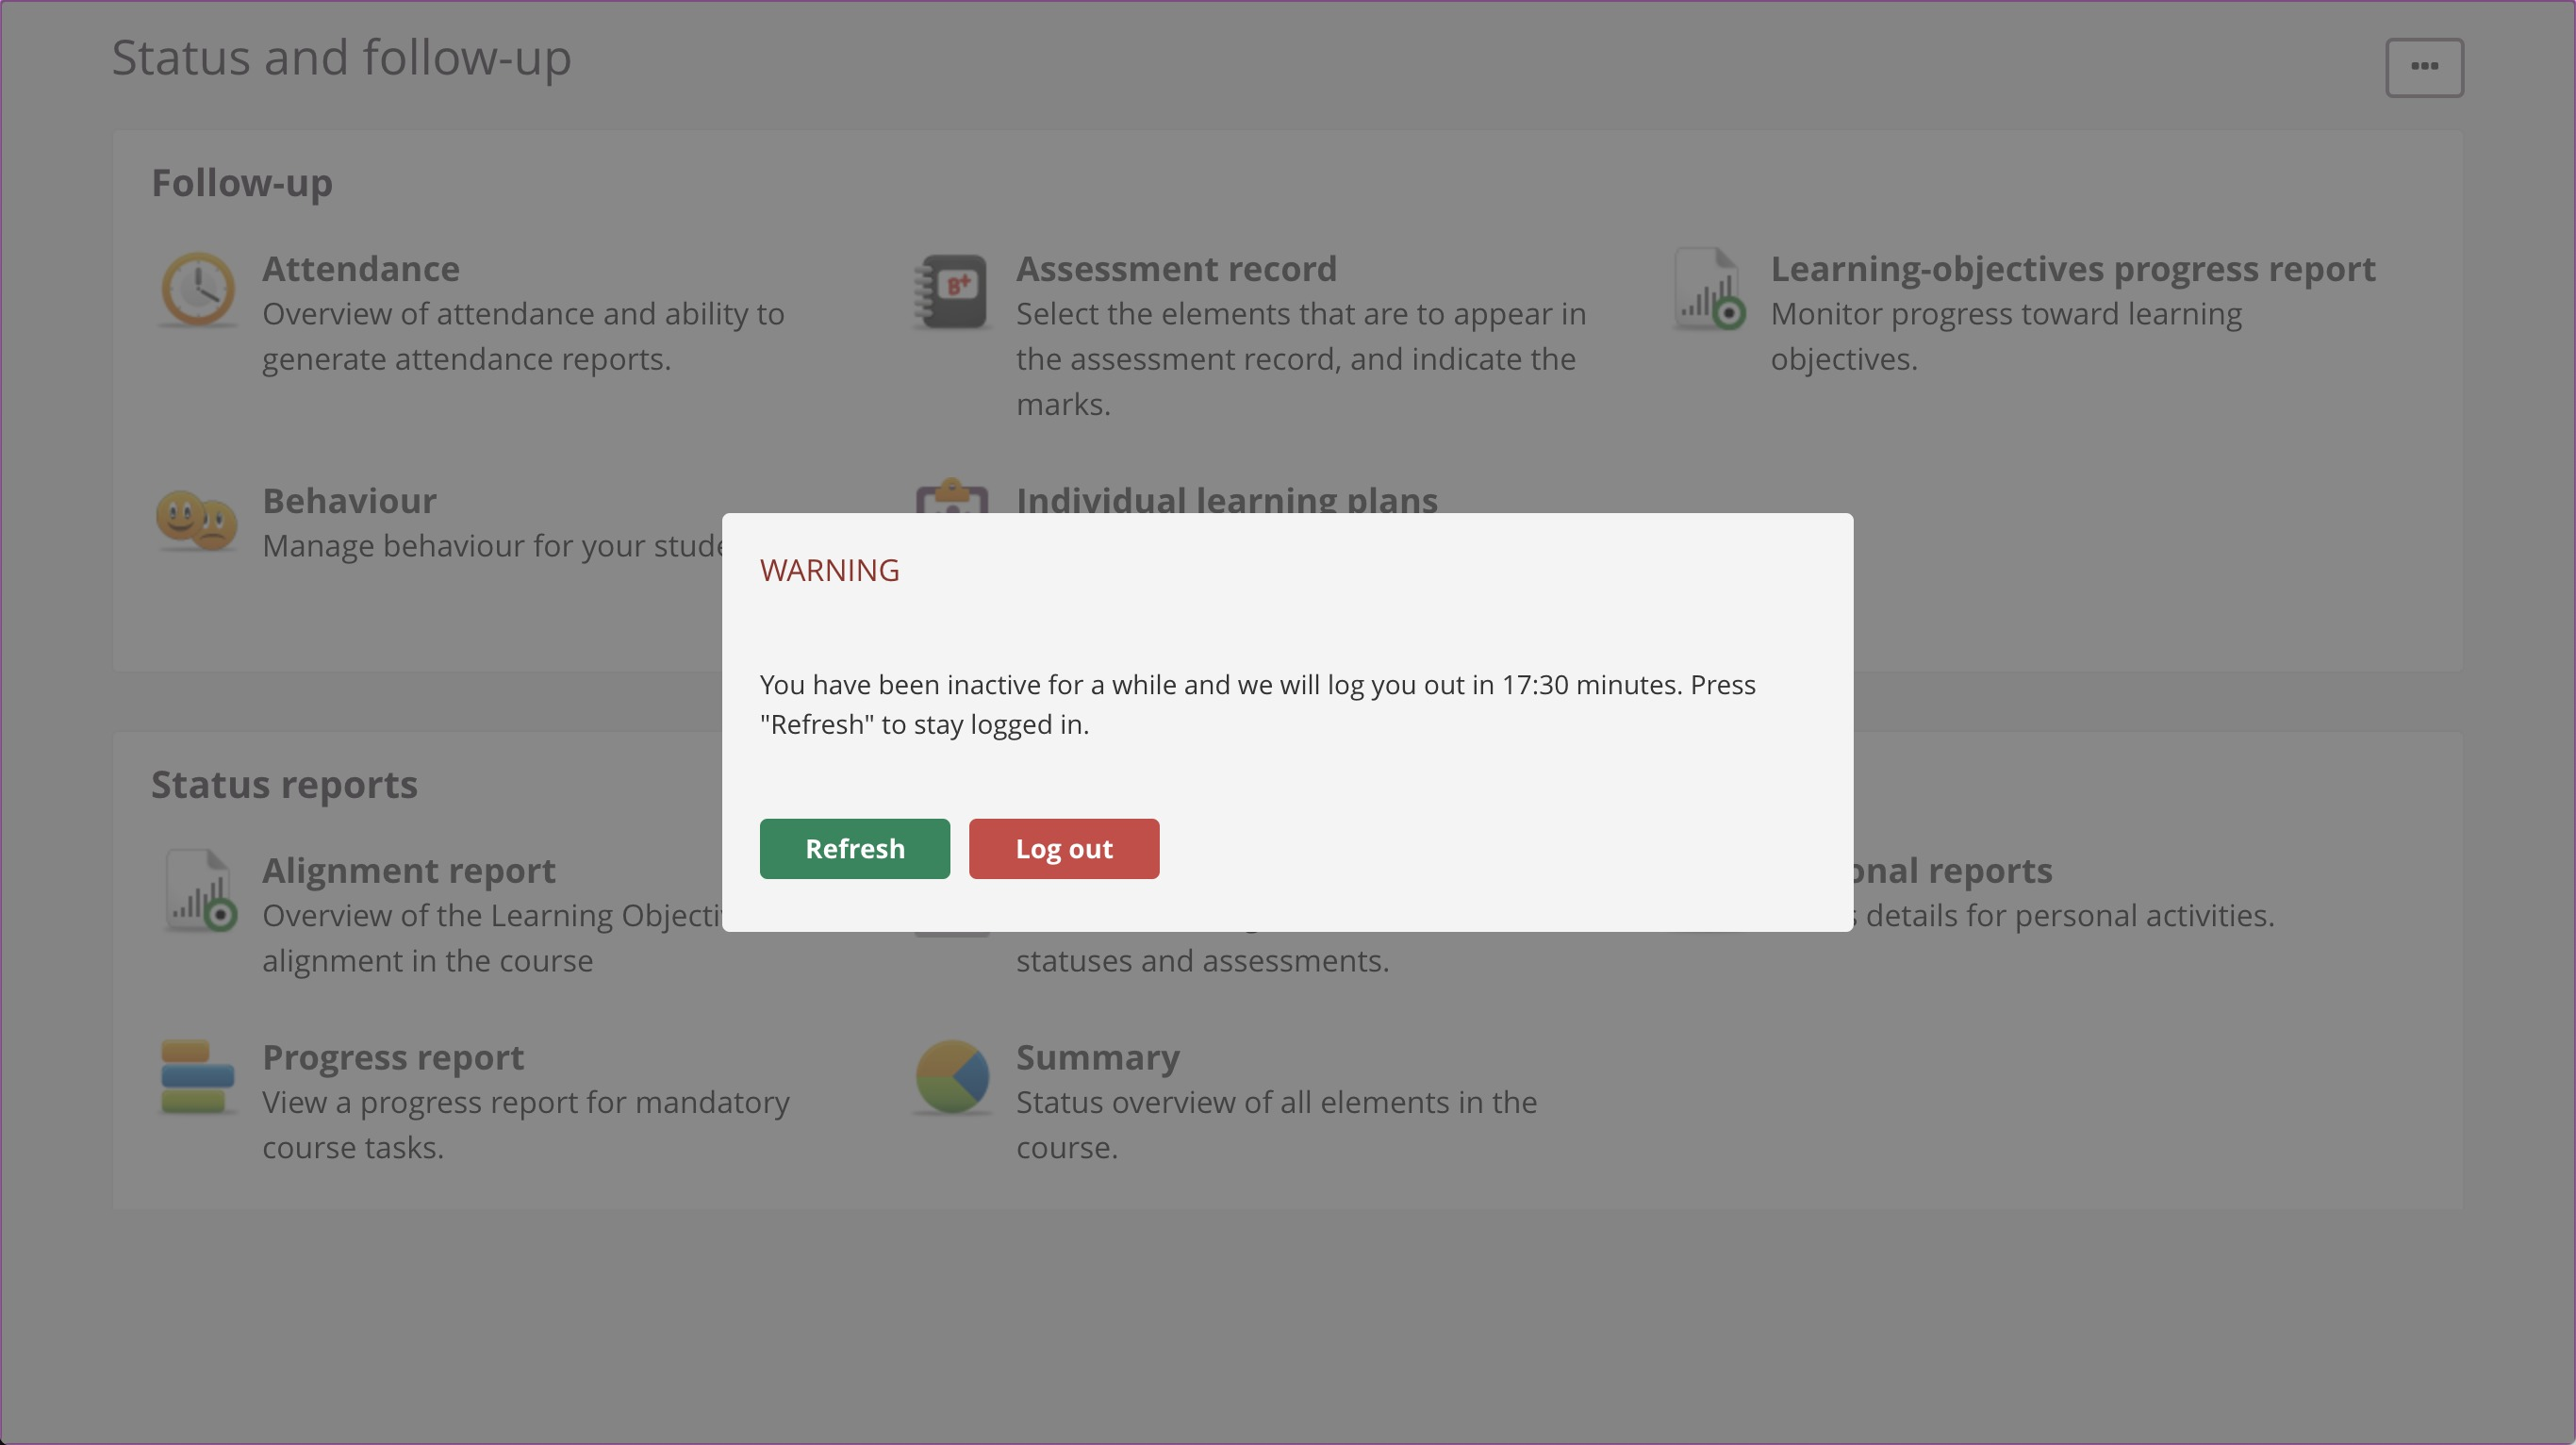 screenshot automatic logout